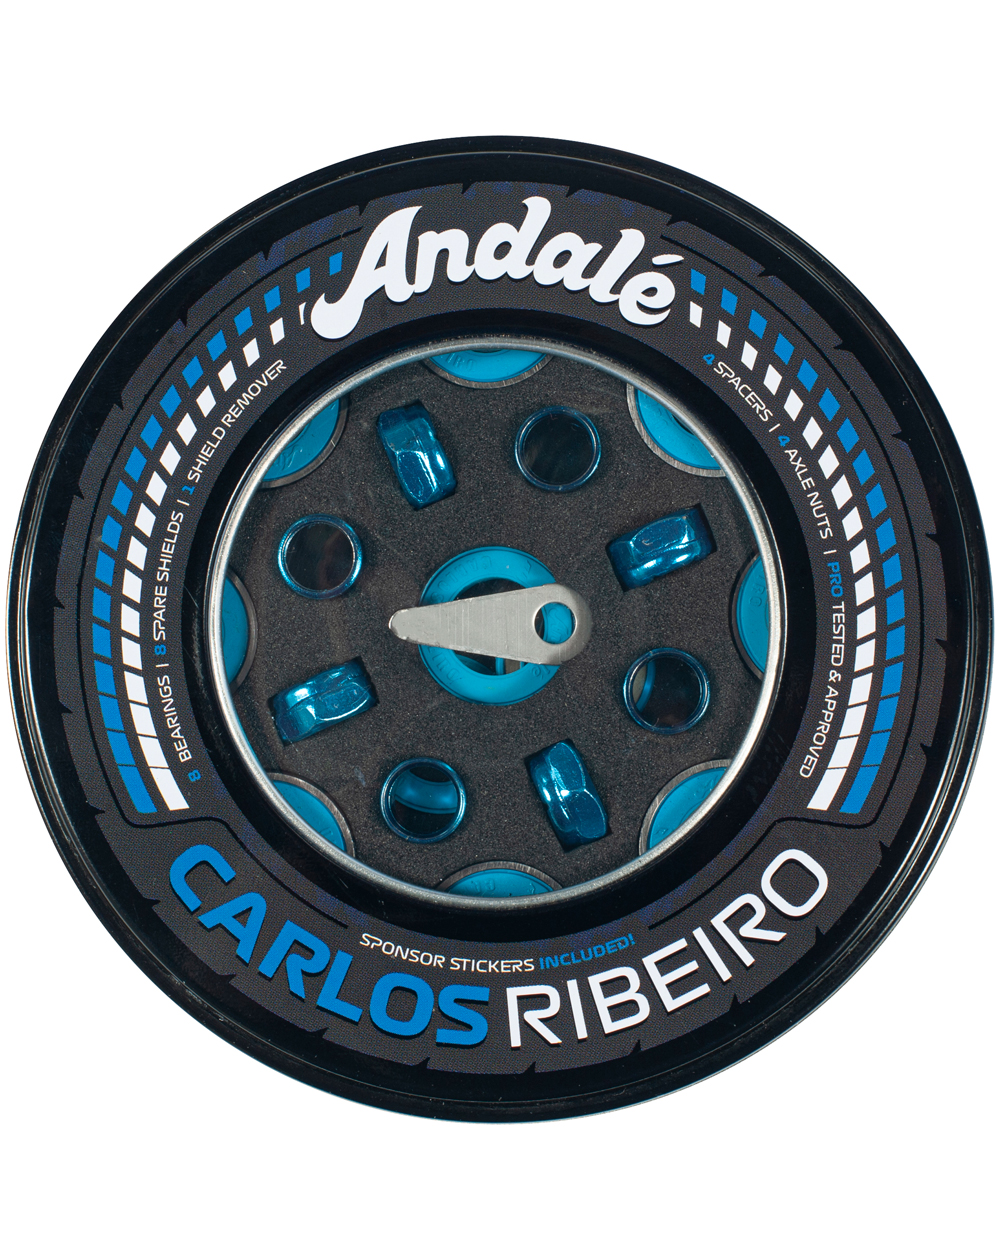 Andalé Roulements Skateboard Carlos Ribeiro Pro